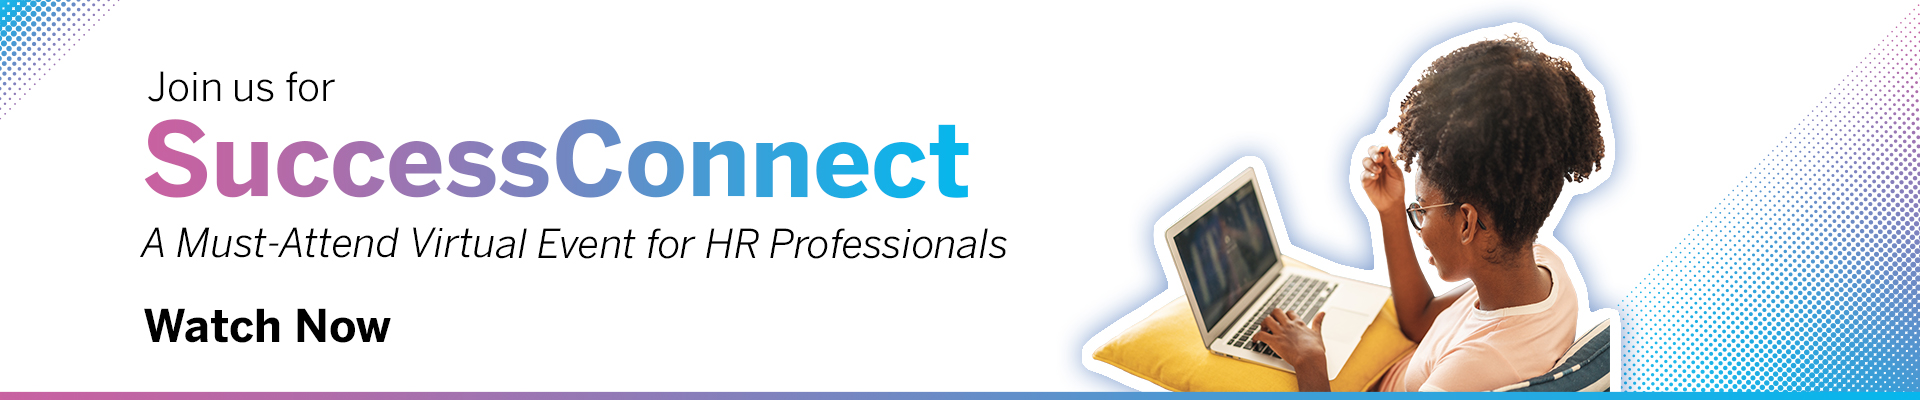 SuccessConnect2021-WatchReplays-WebBanner-Desktop-1920x400